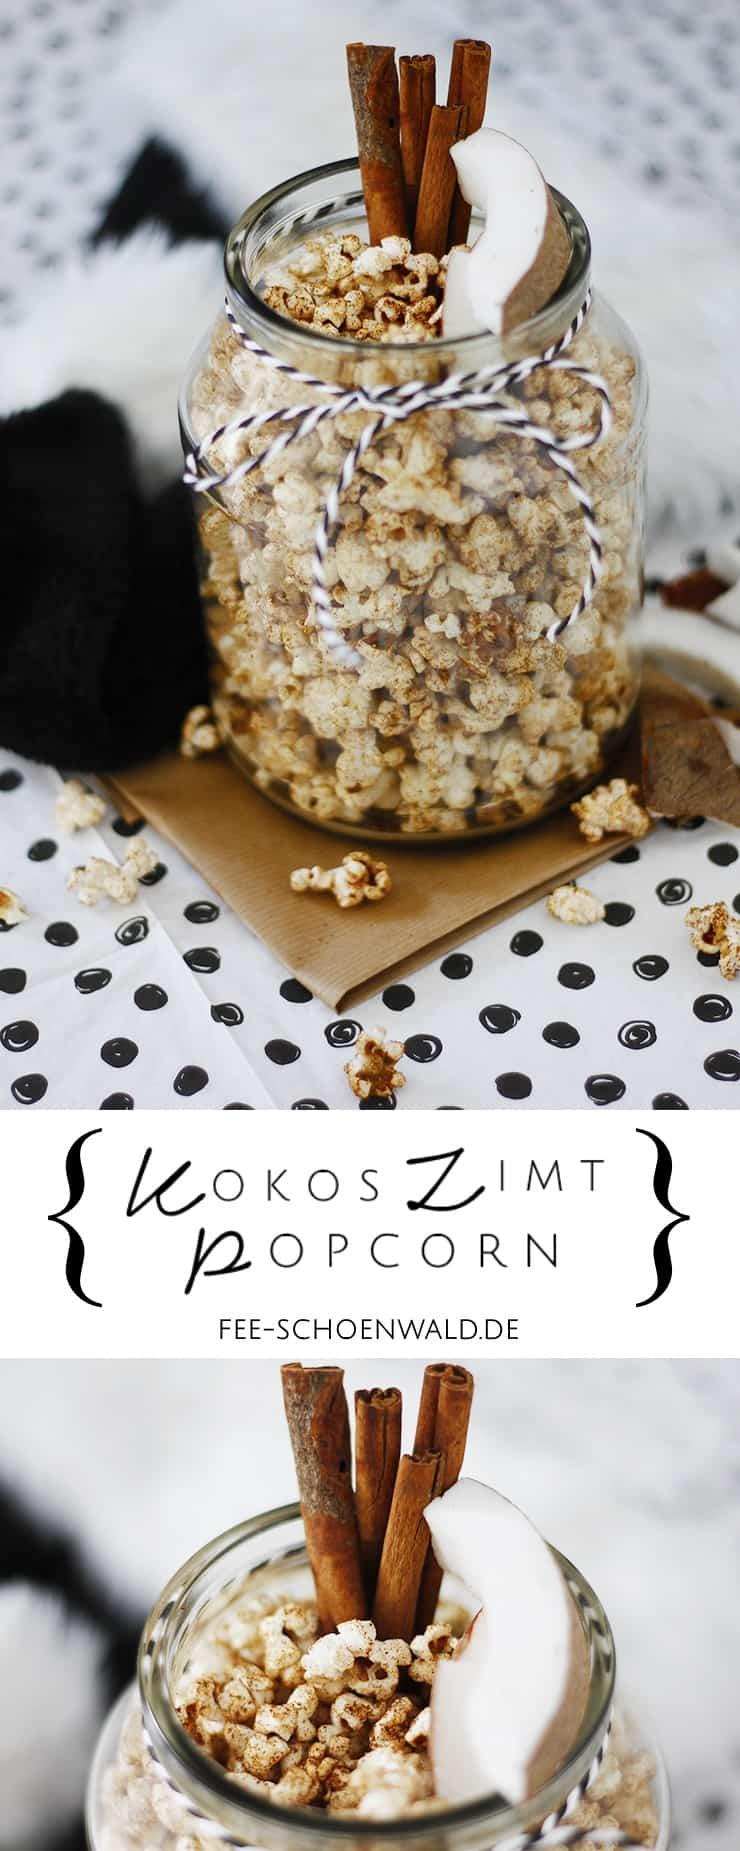 food kokos zimt popcorn rezept werbung fee. Black Bedroom Furniture Sets. Home Design Ideas